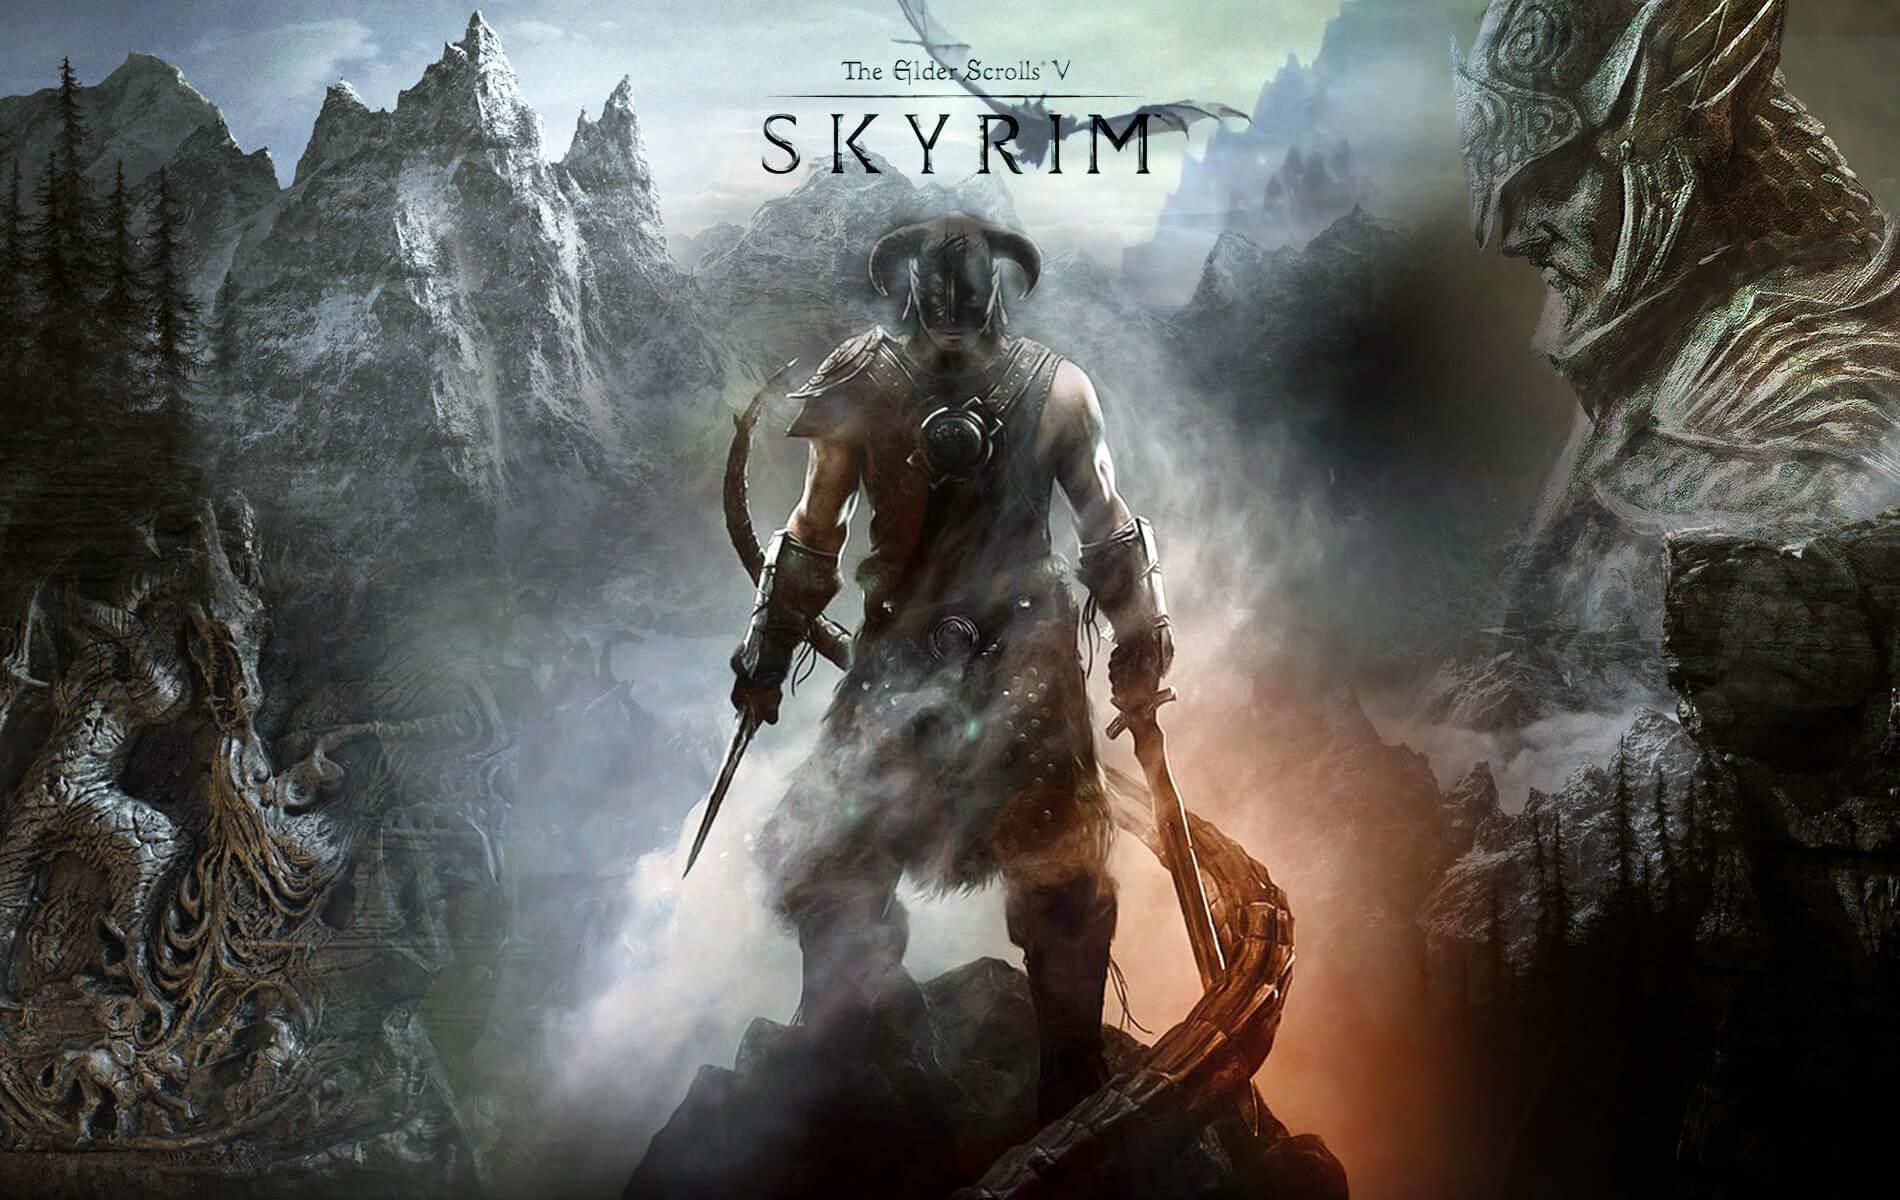 The Elder Scrolls V: Skyrim Walkthrough